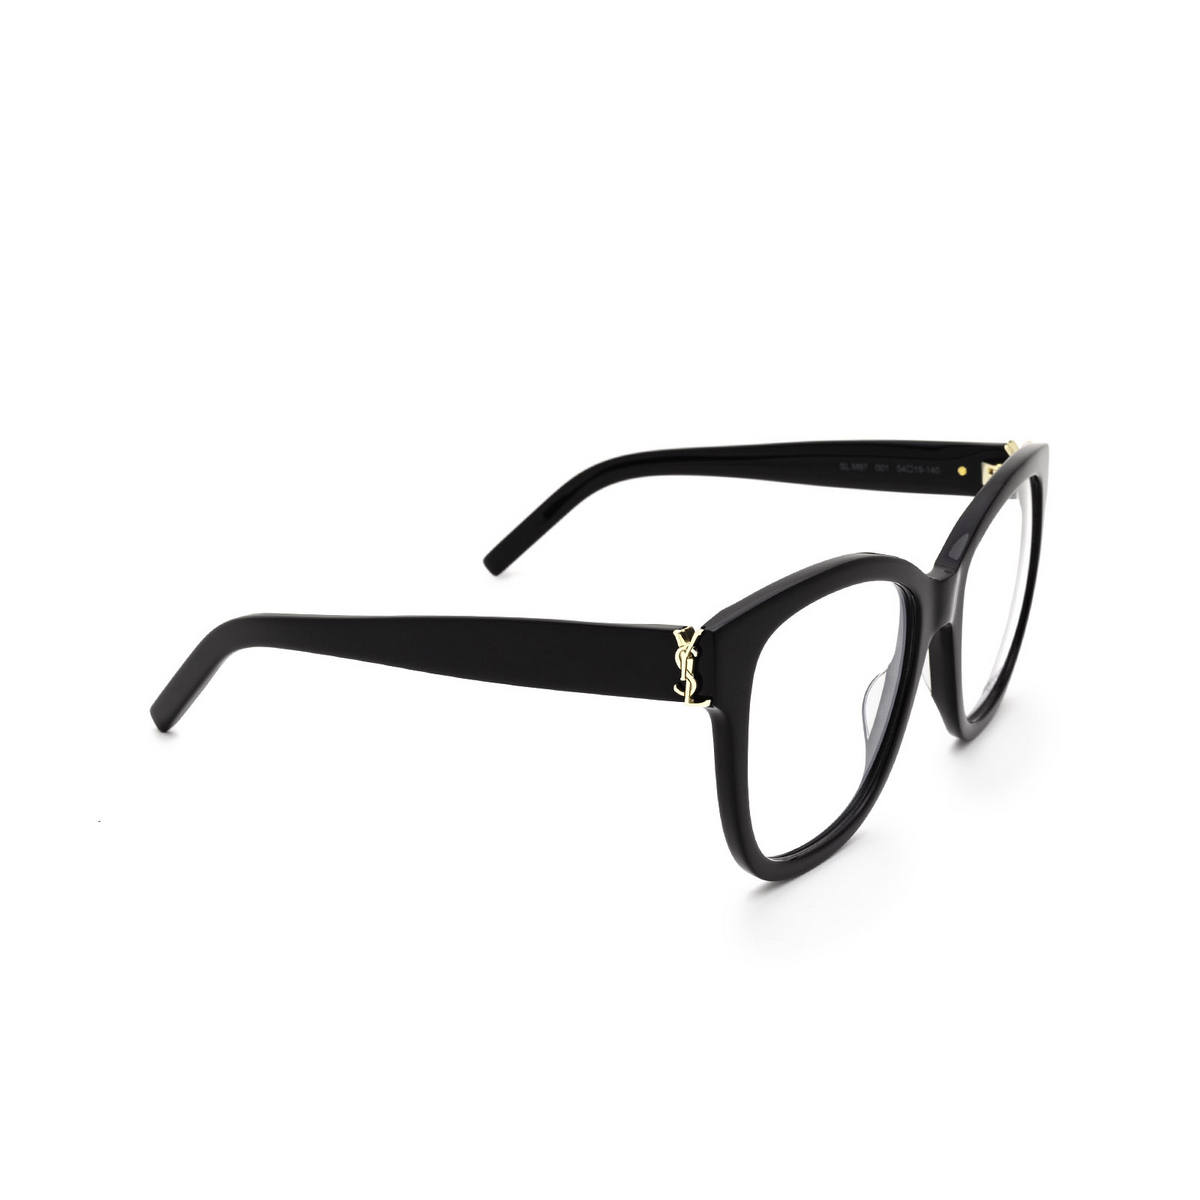 Saint Laurent® Square Eyeglasses: SL M97 color Black 001 - three-quarters view.